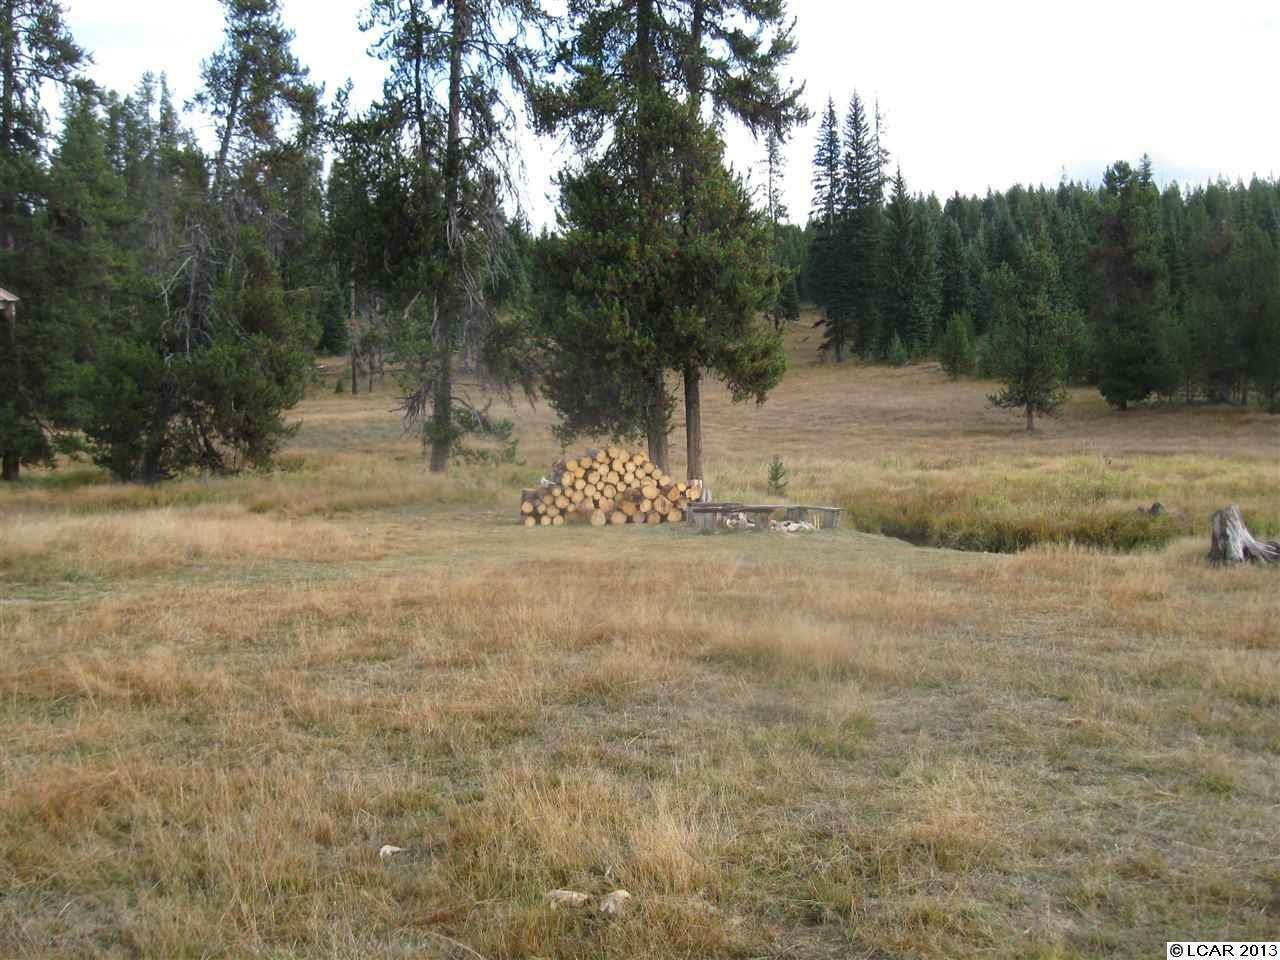 Tbd Elk Creek Rd, Elk City, ID - USA (photo 4)